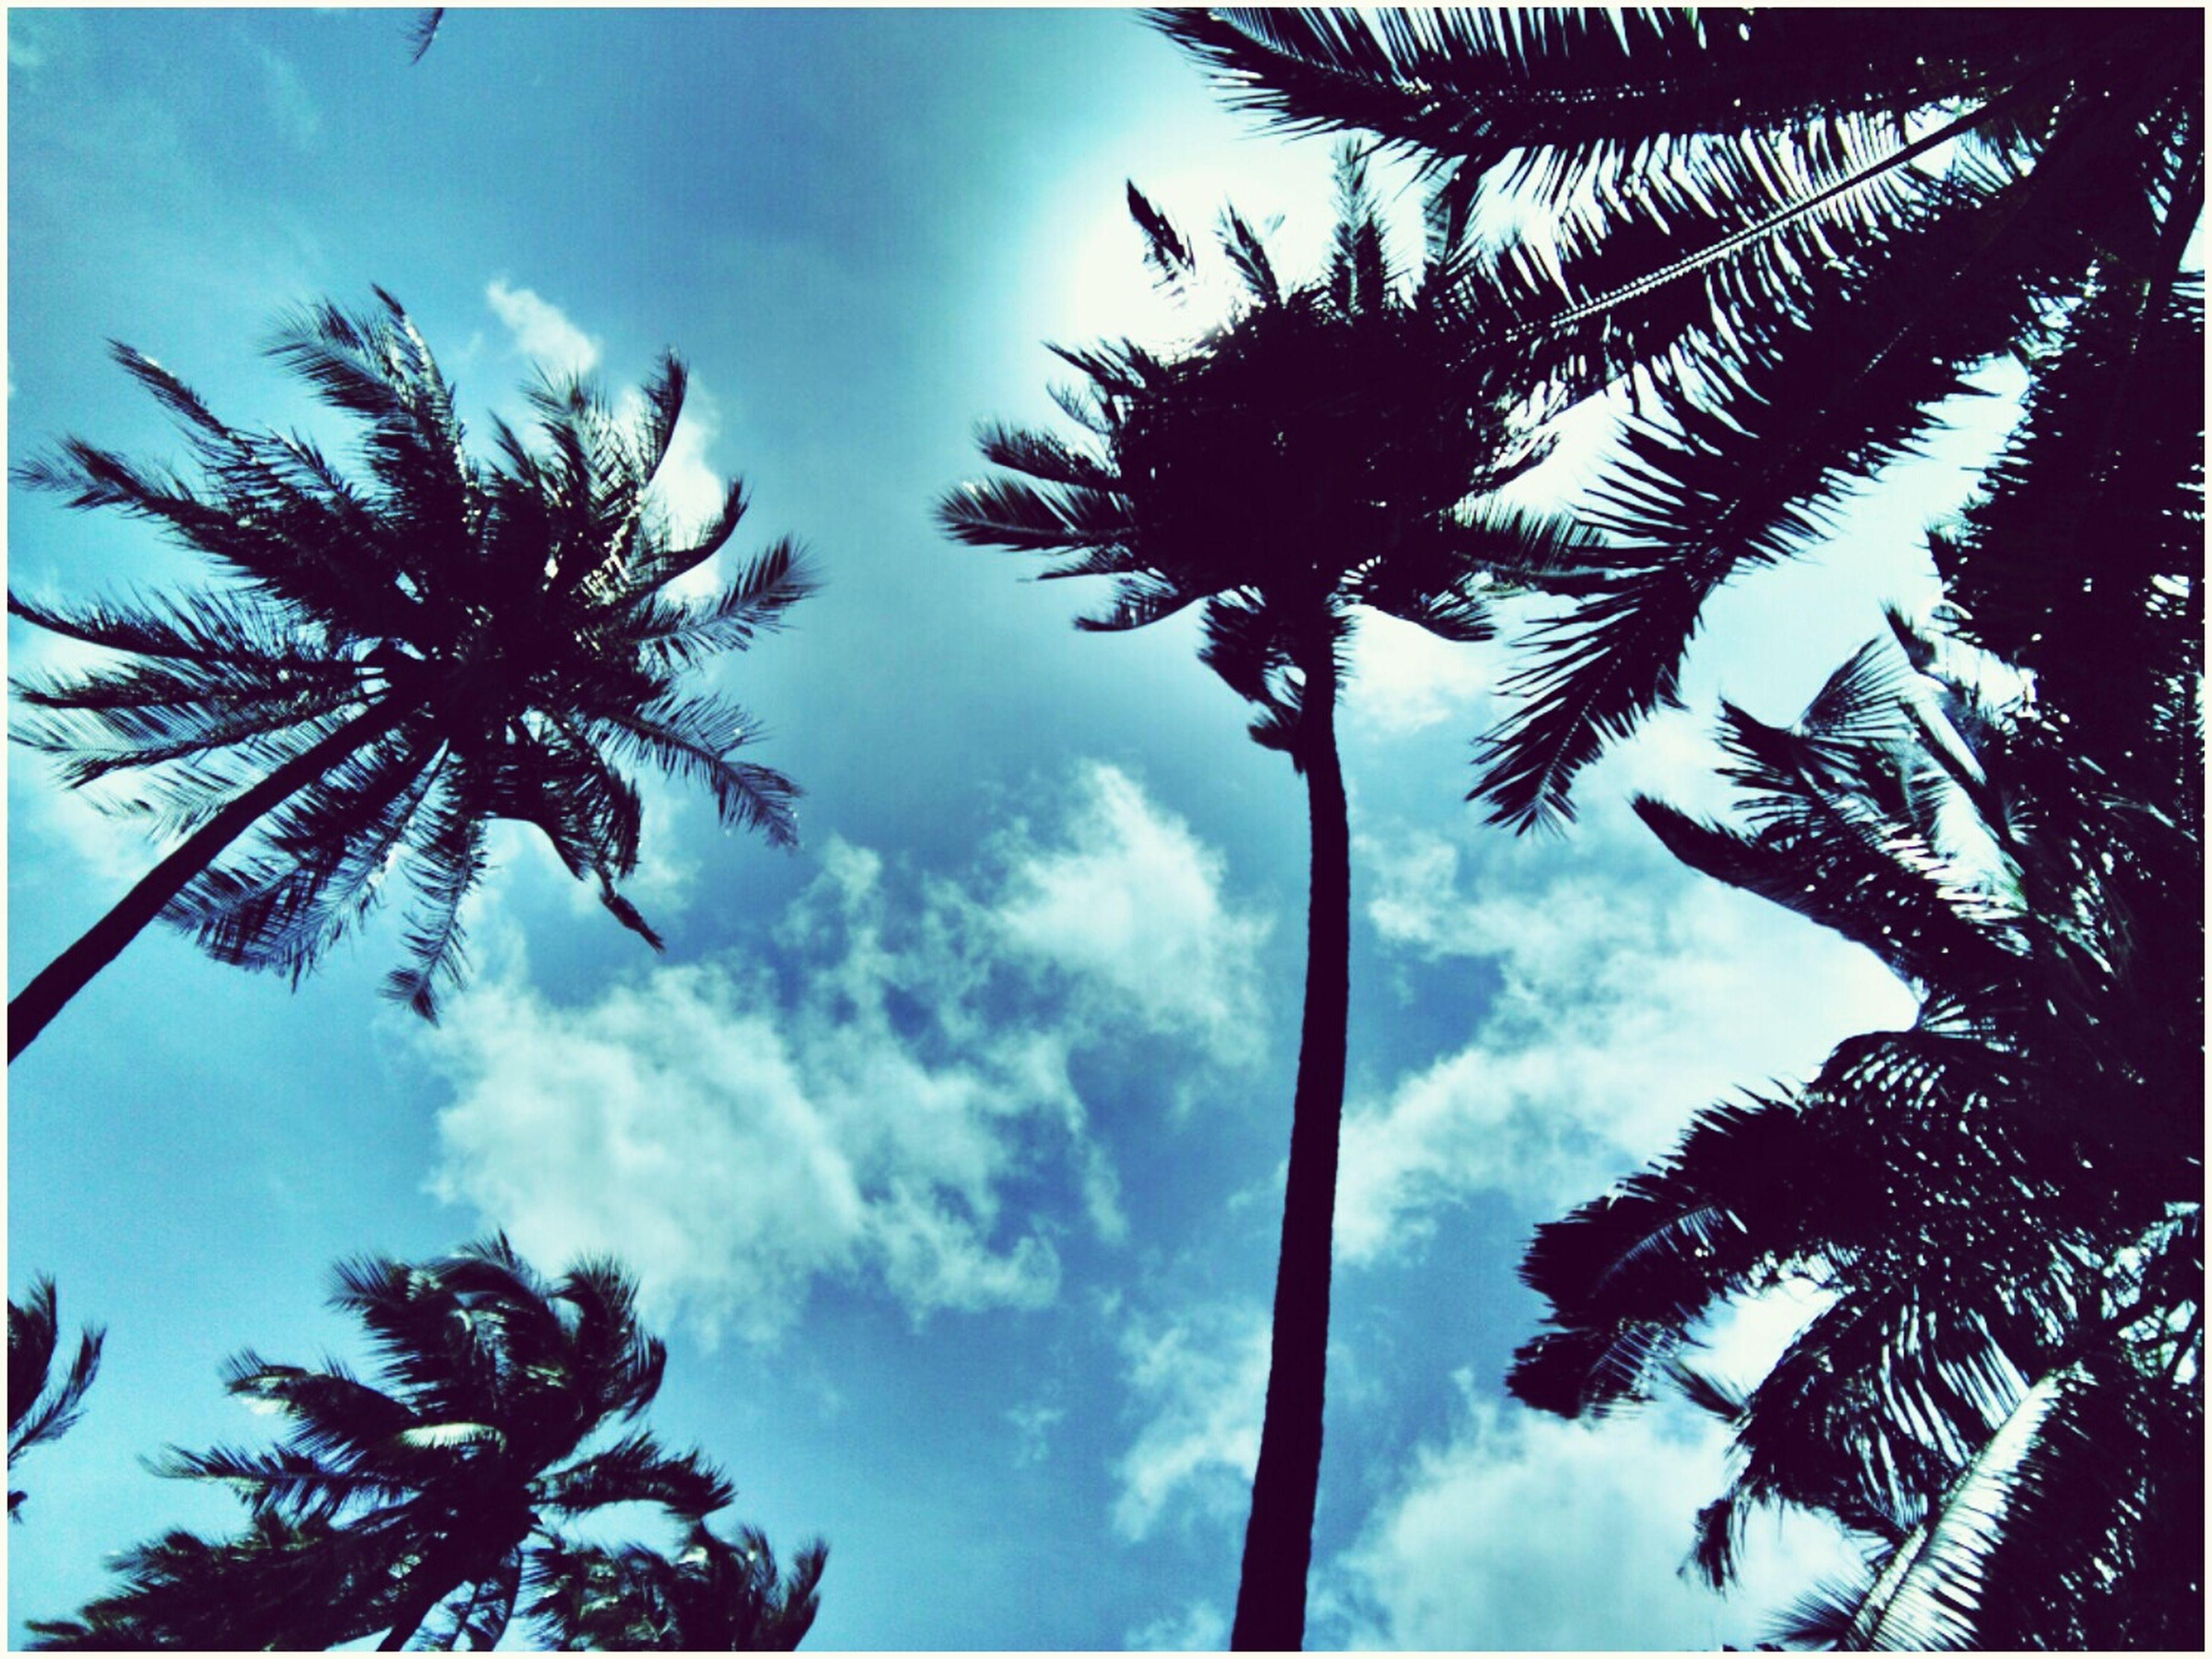 Sky😍 Palm Tree Tree Sky Day Blue Nature Beauty In Nature Coconut Palm Tree Thailand Tall - High Tall Likeforlike Follow4follow